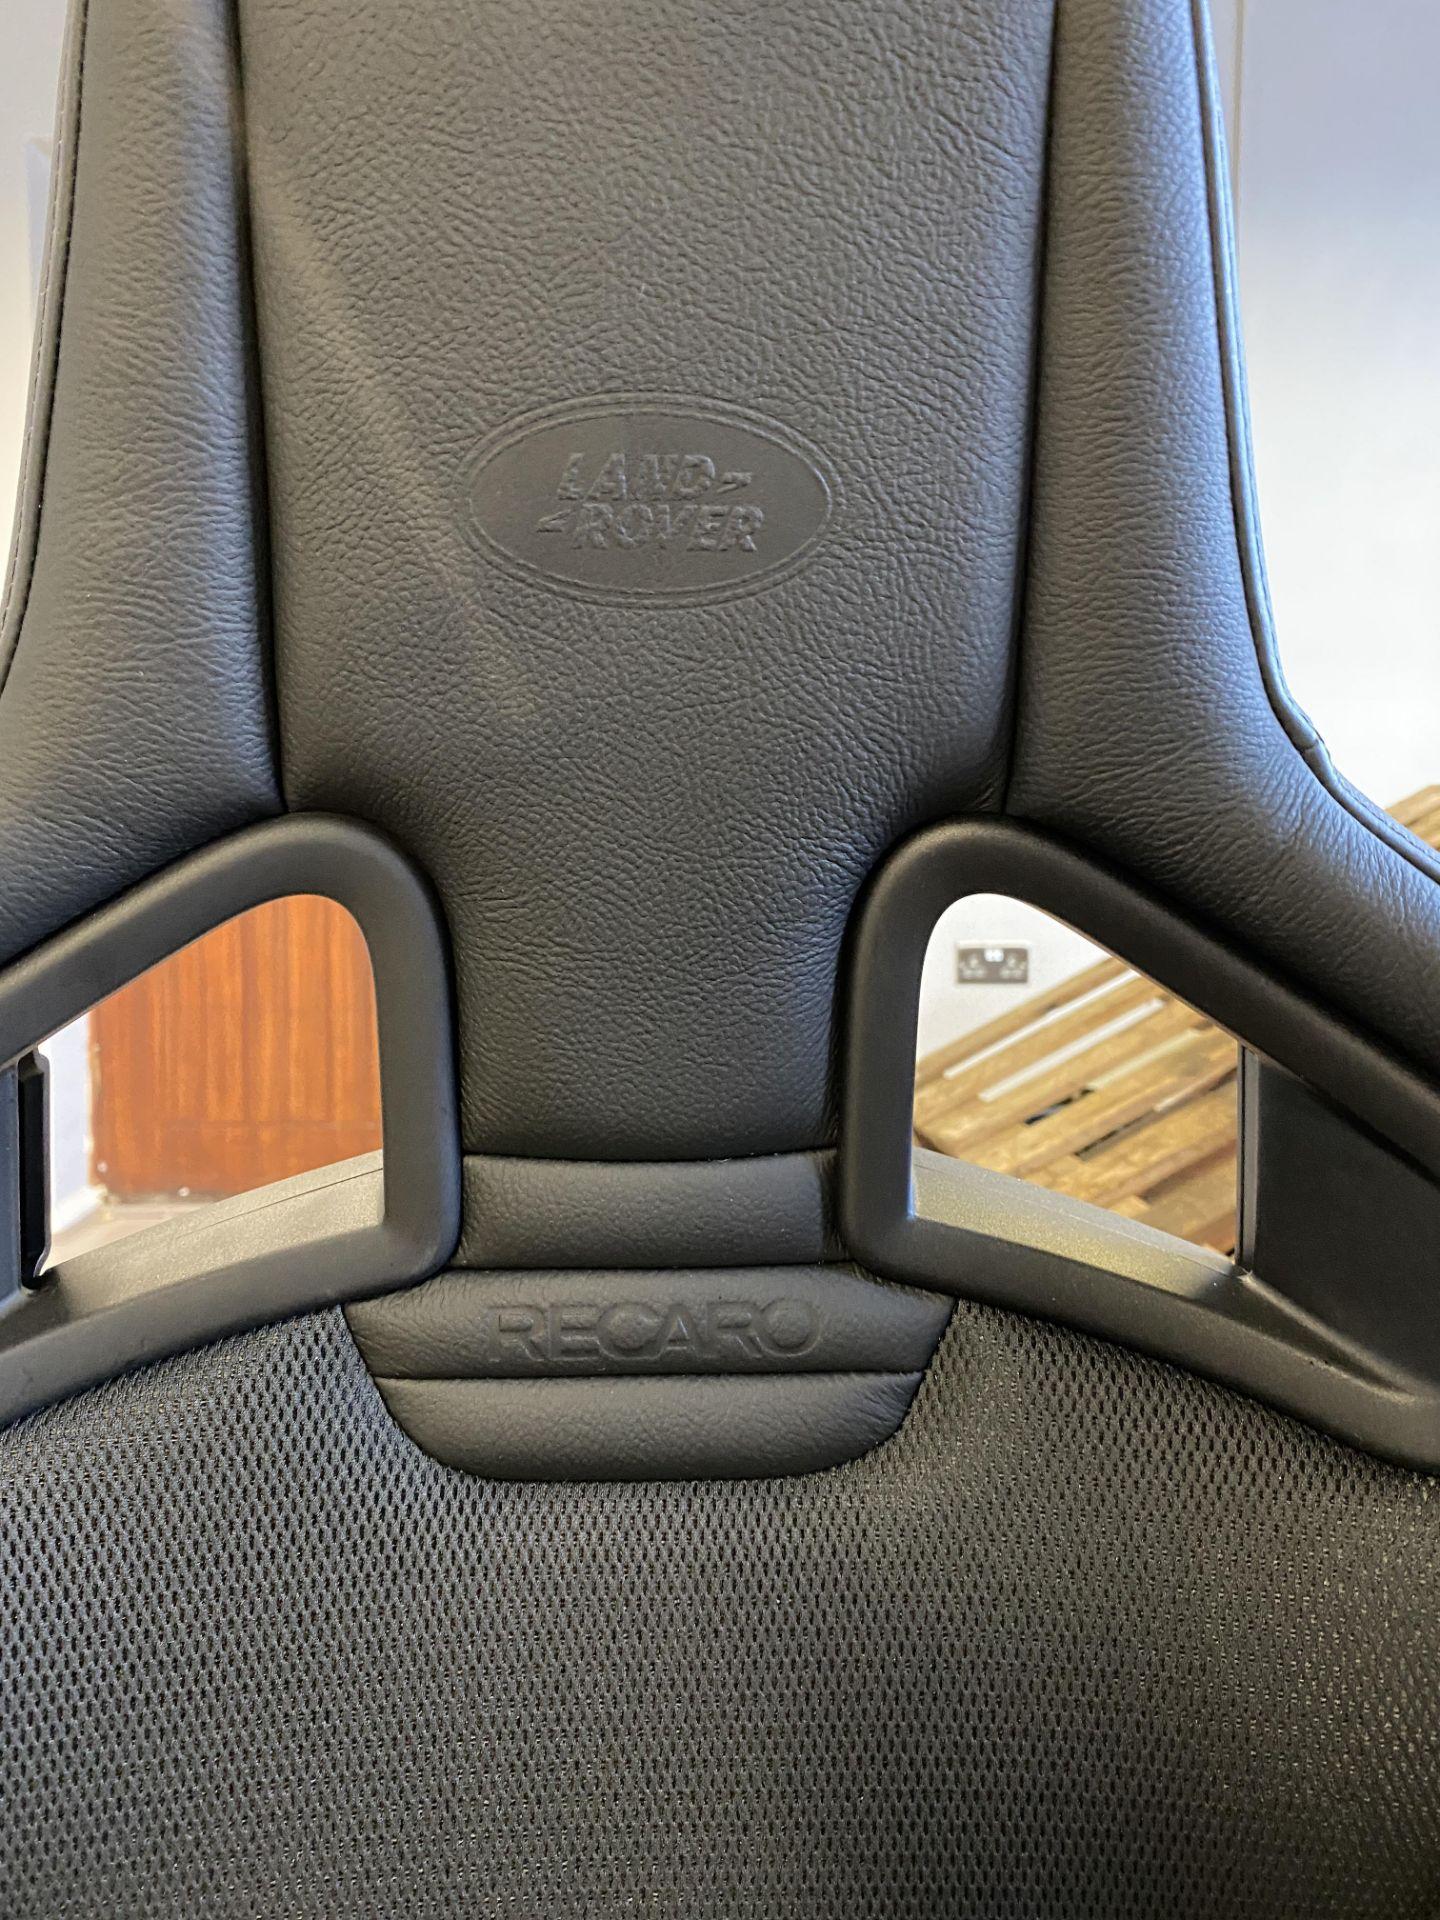 Pair of LH & RH Genuine Recaro Defender Heated Seats - Image 13 of 35